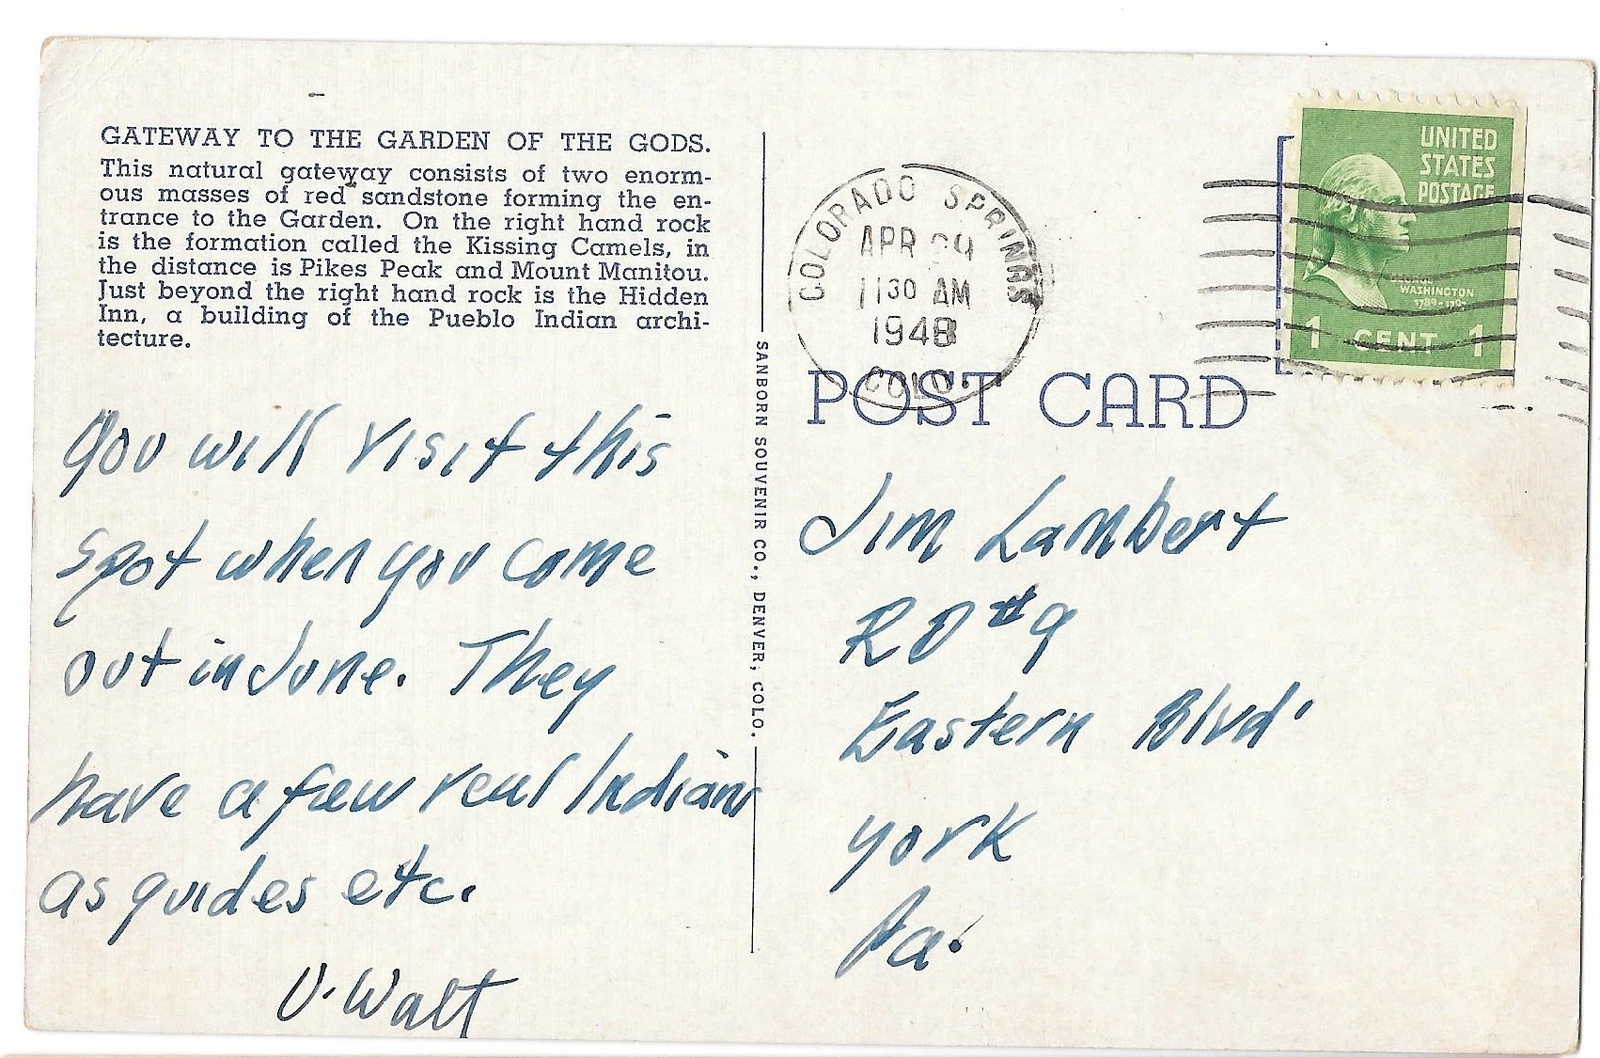 CO Pikes Peak Gateway Garden of the Gods Vintage Postcard Colorado